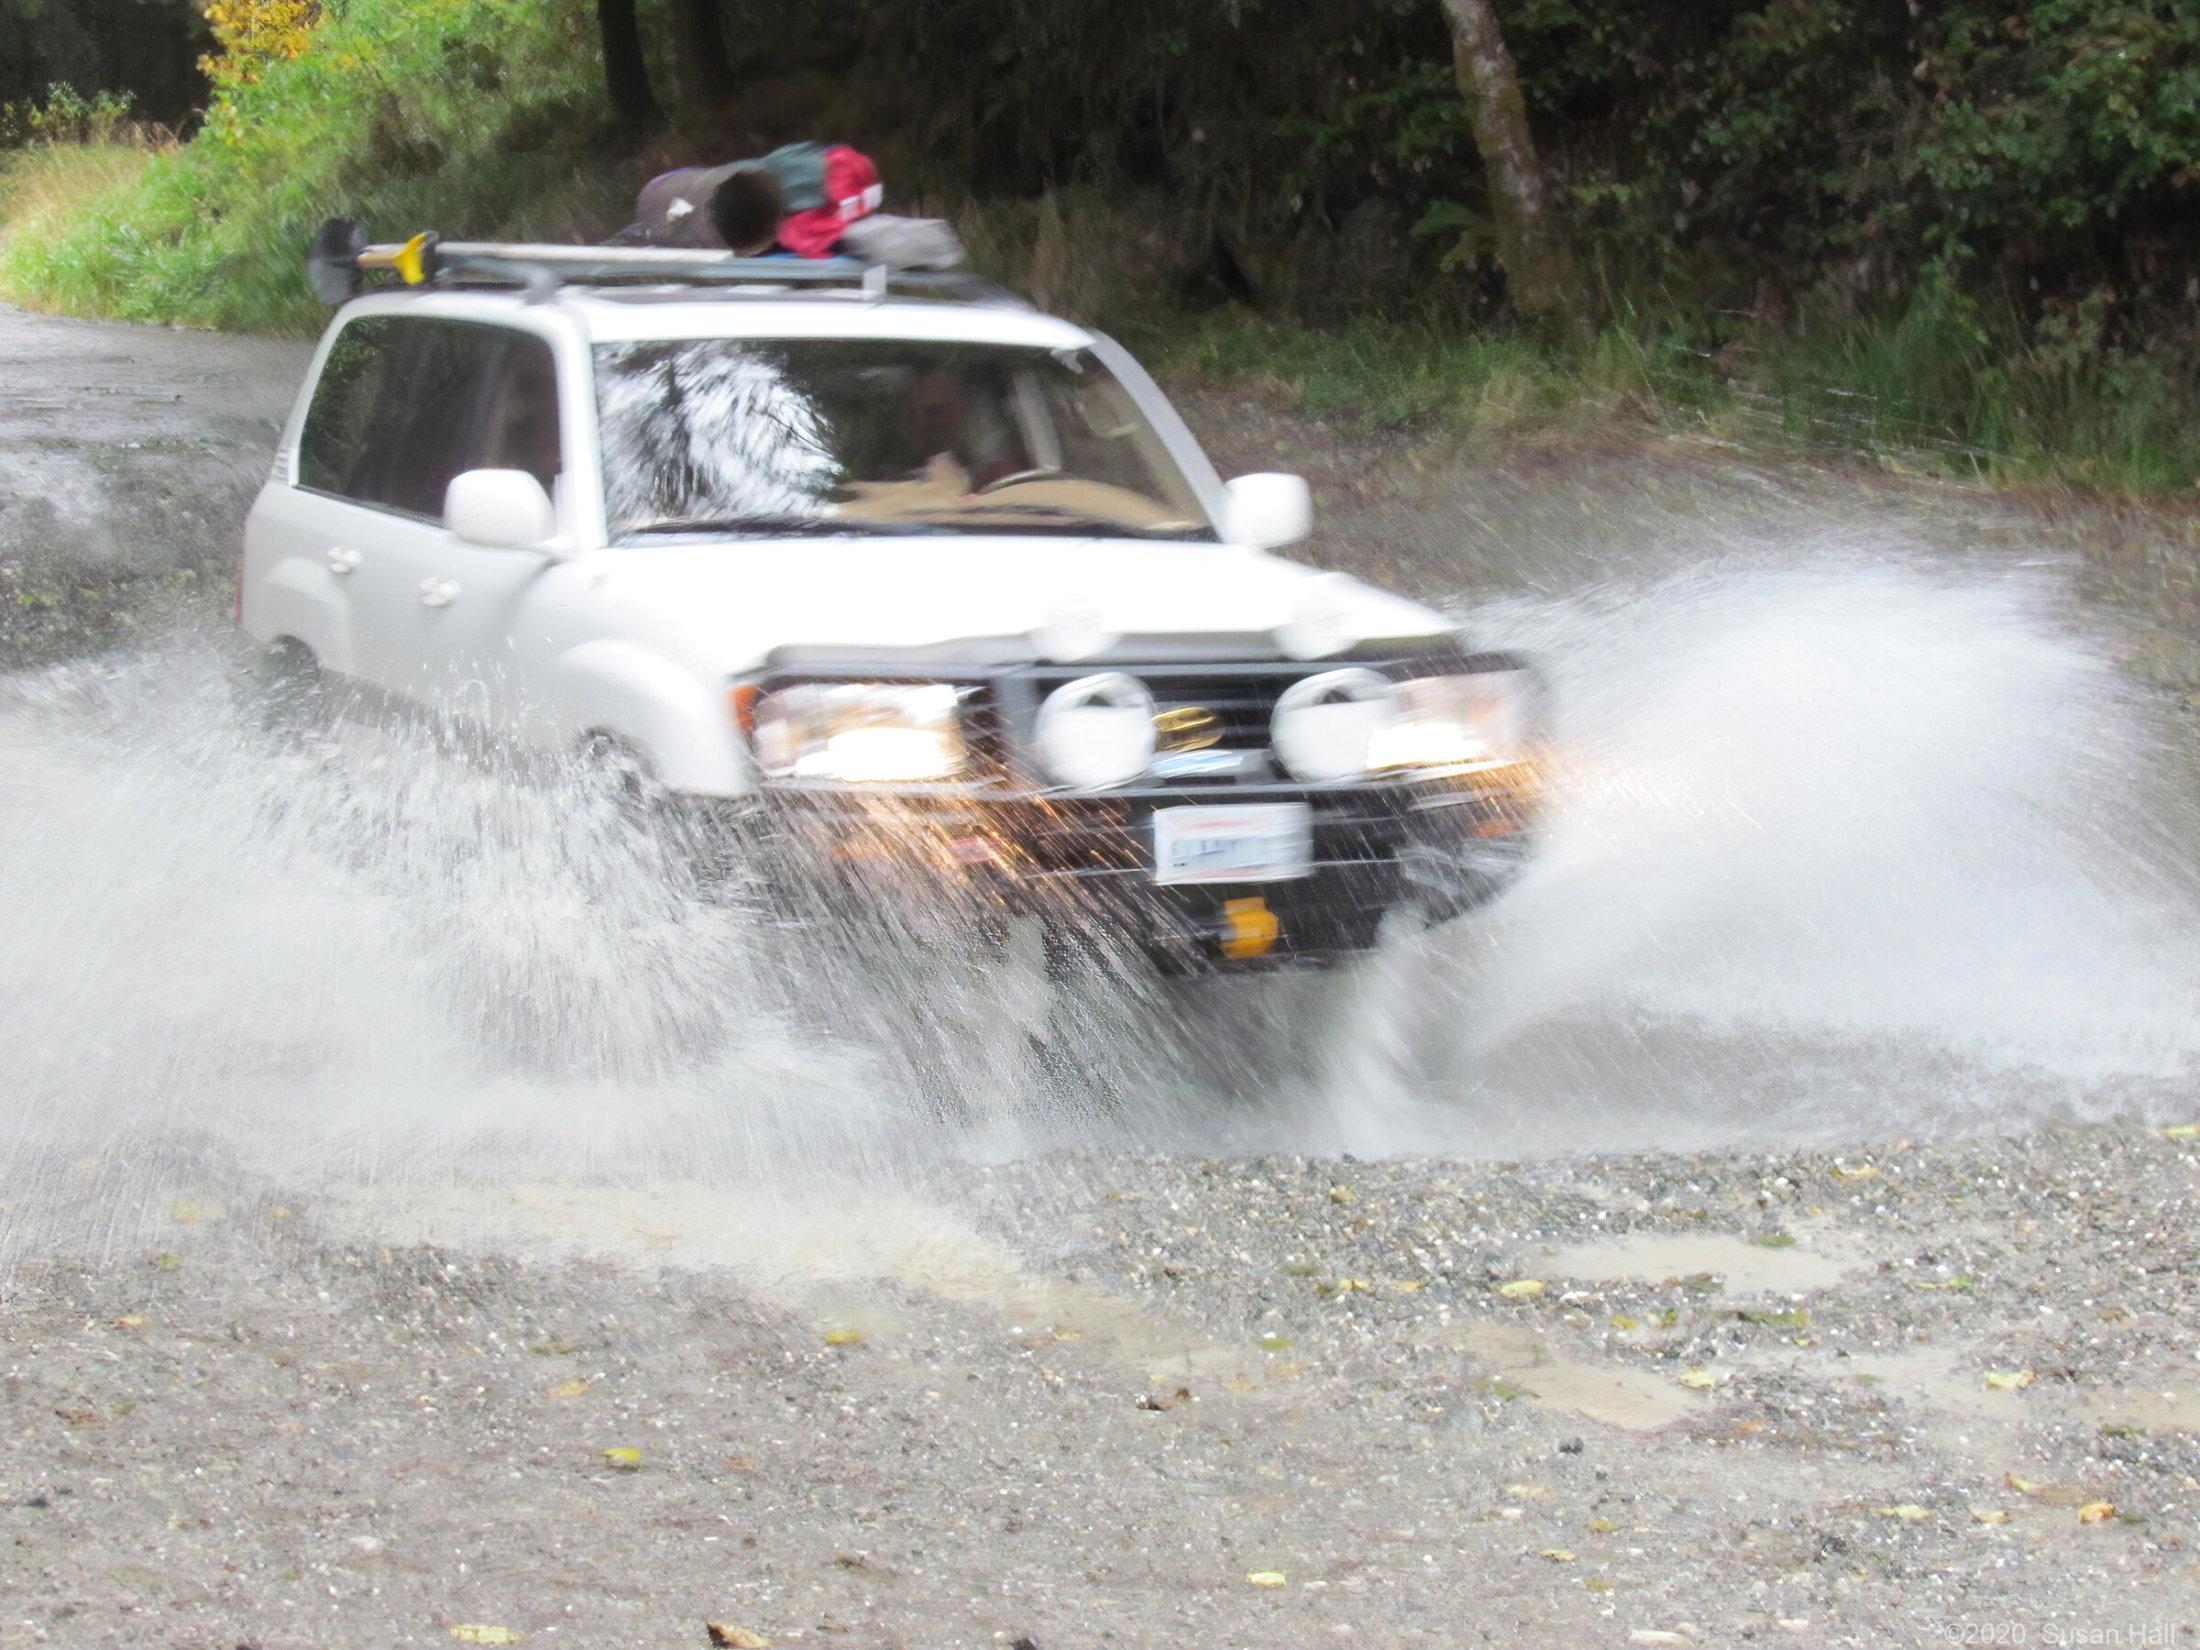 Blasting through a stream